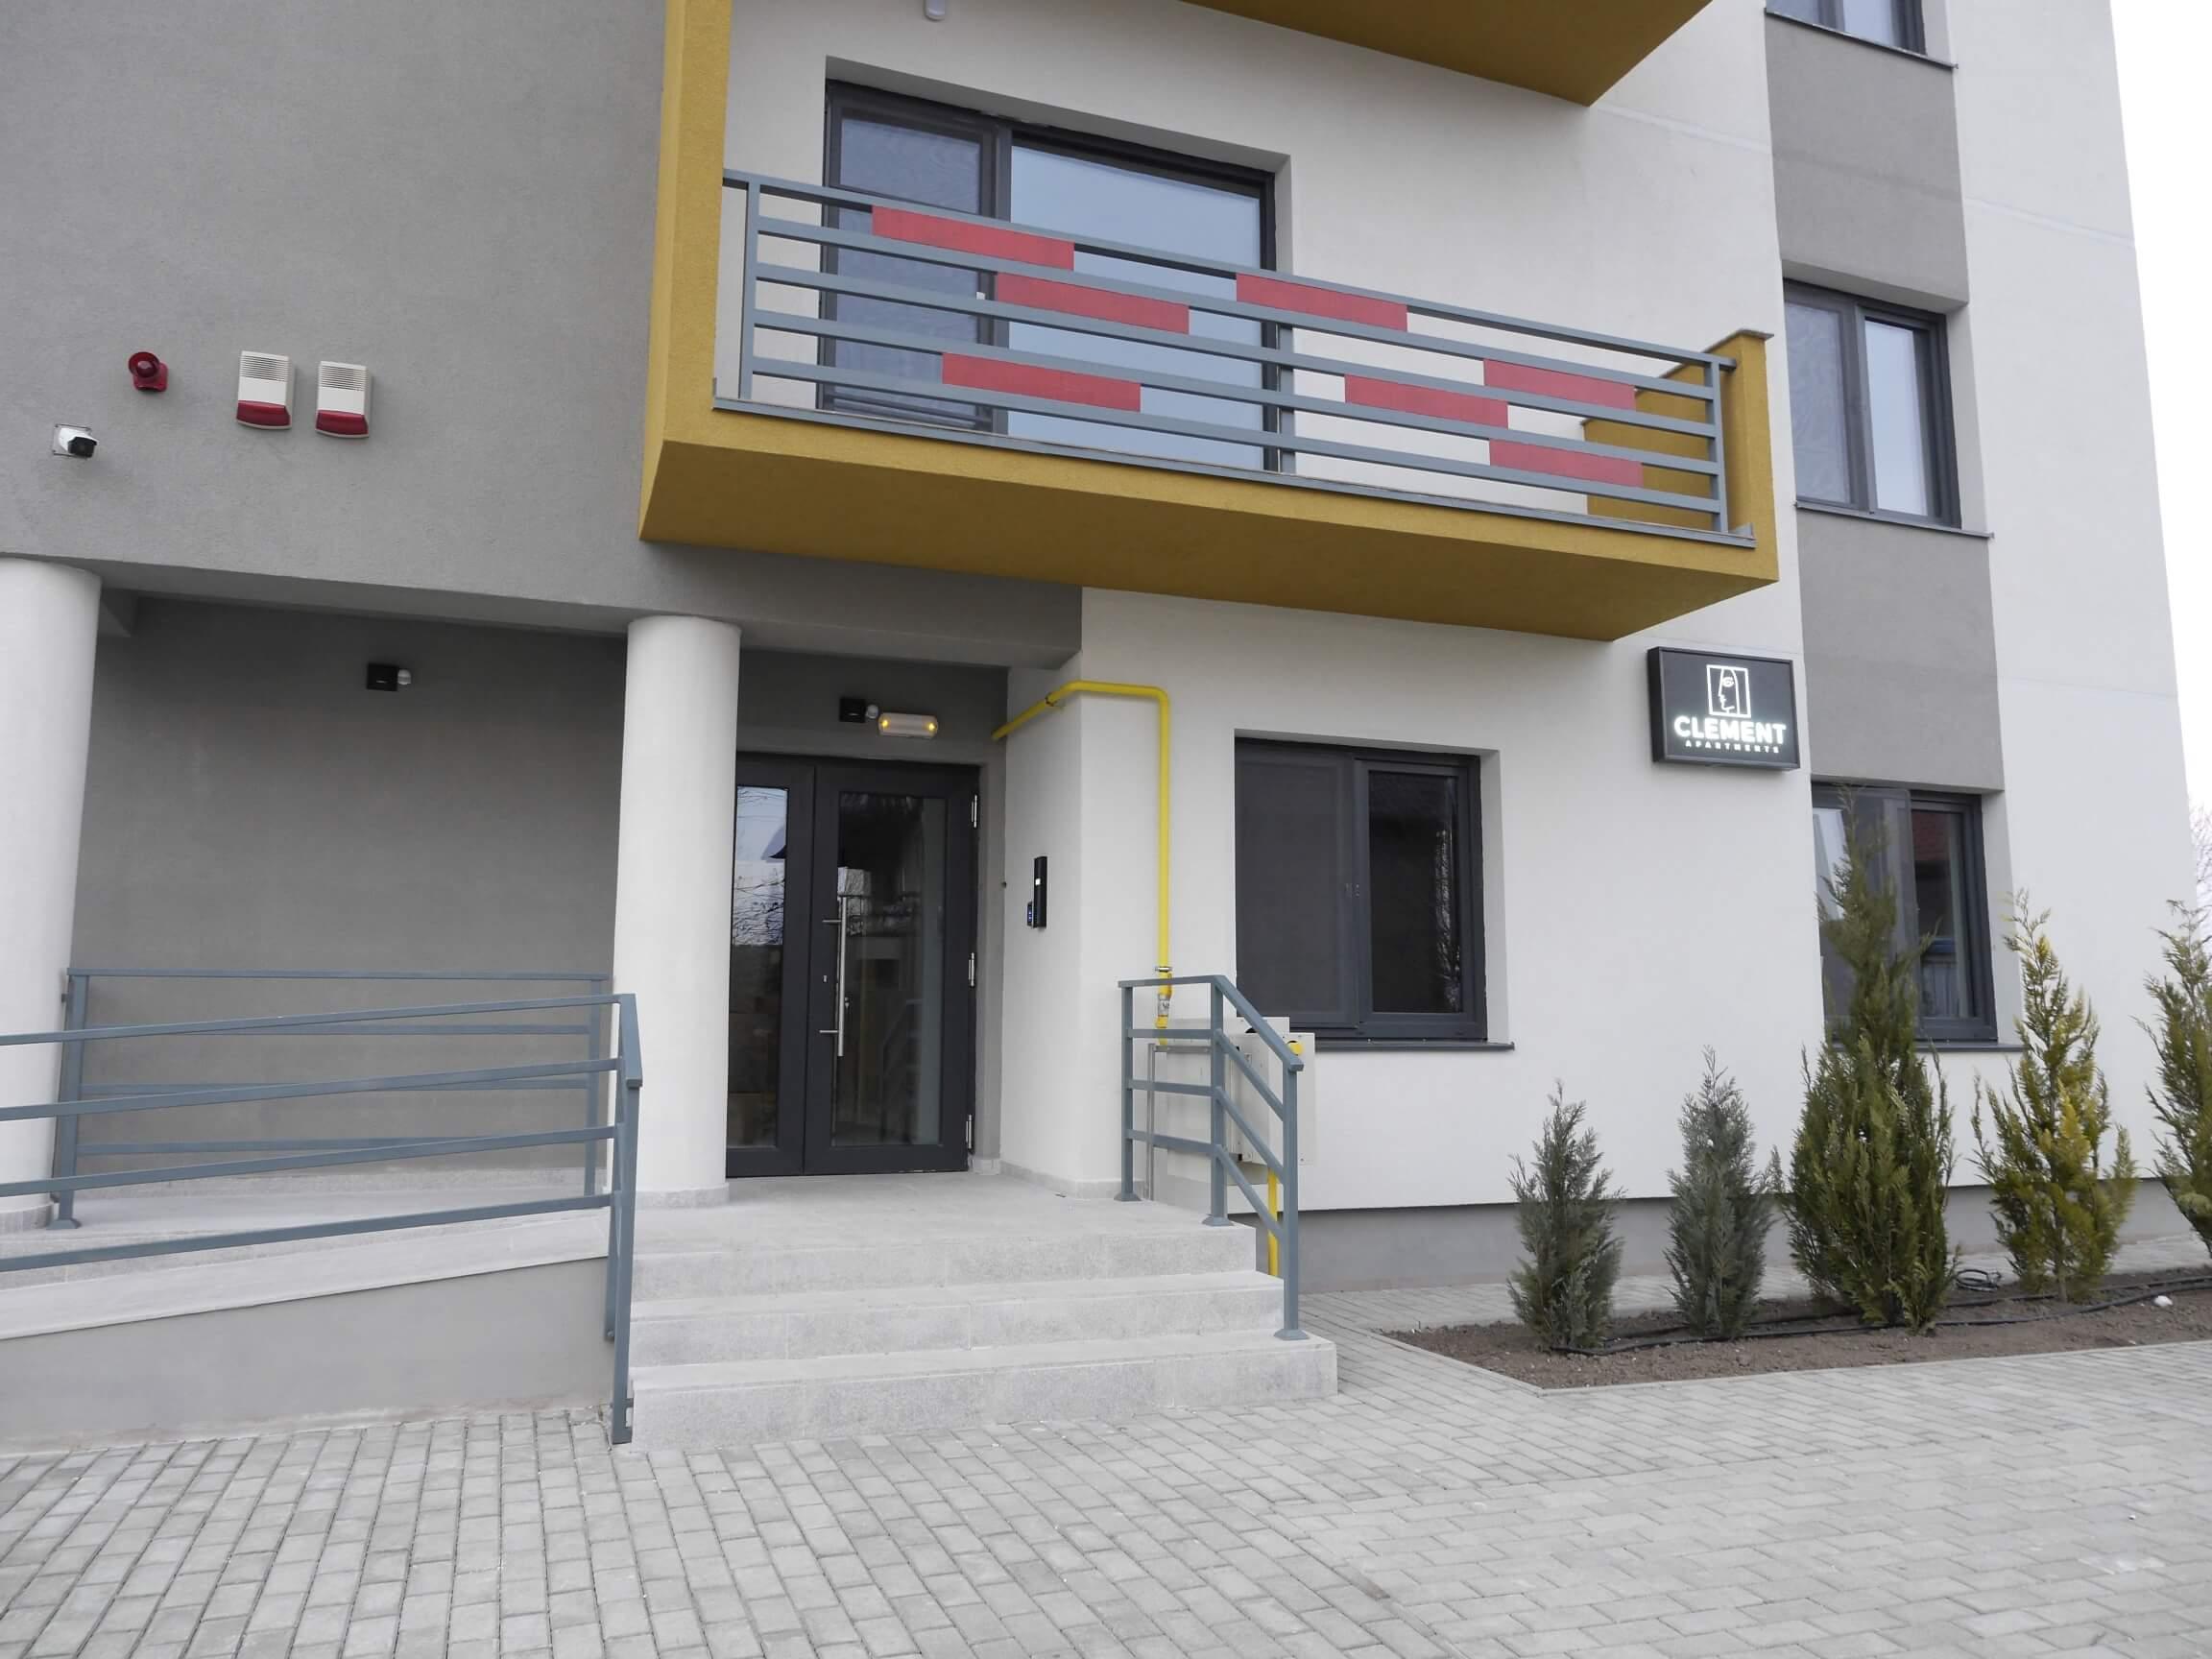 Clement Apartments - Cazare Neamt - Cazare Piatra Neamt - Apartamente de inchiriat in regim hotelier (2)